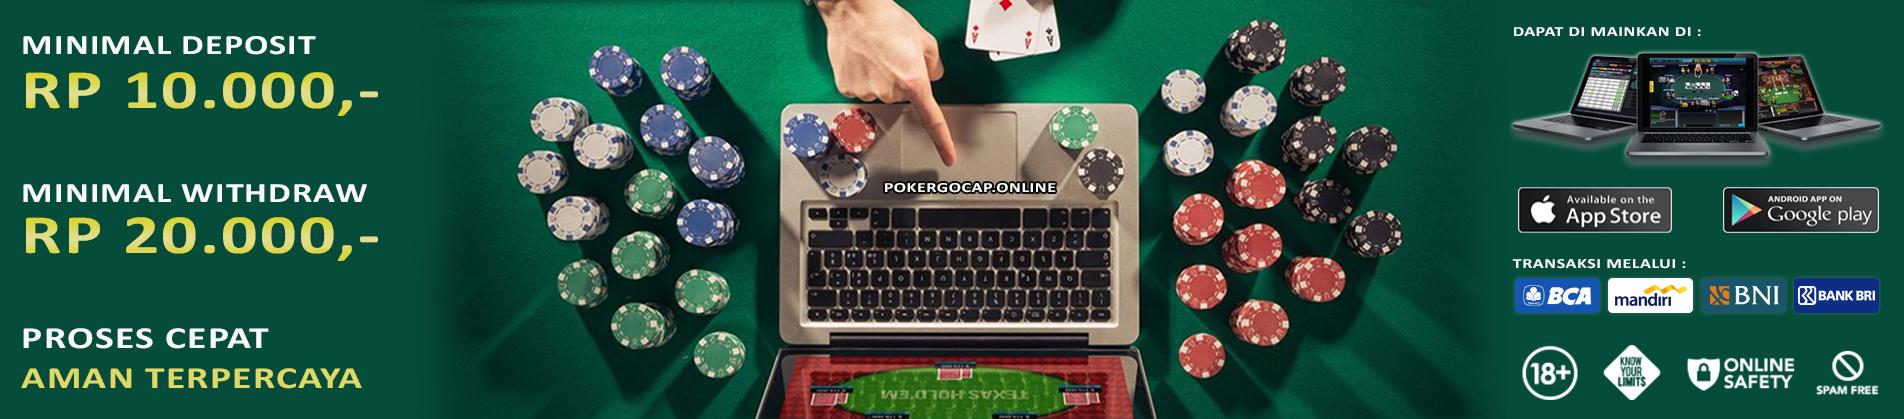 bonus idn pokergocap